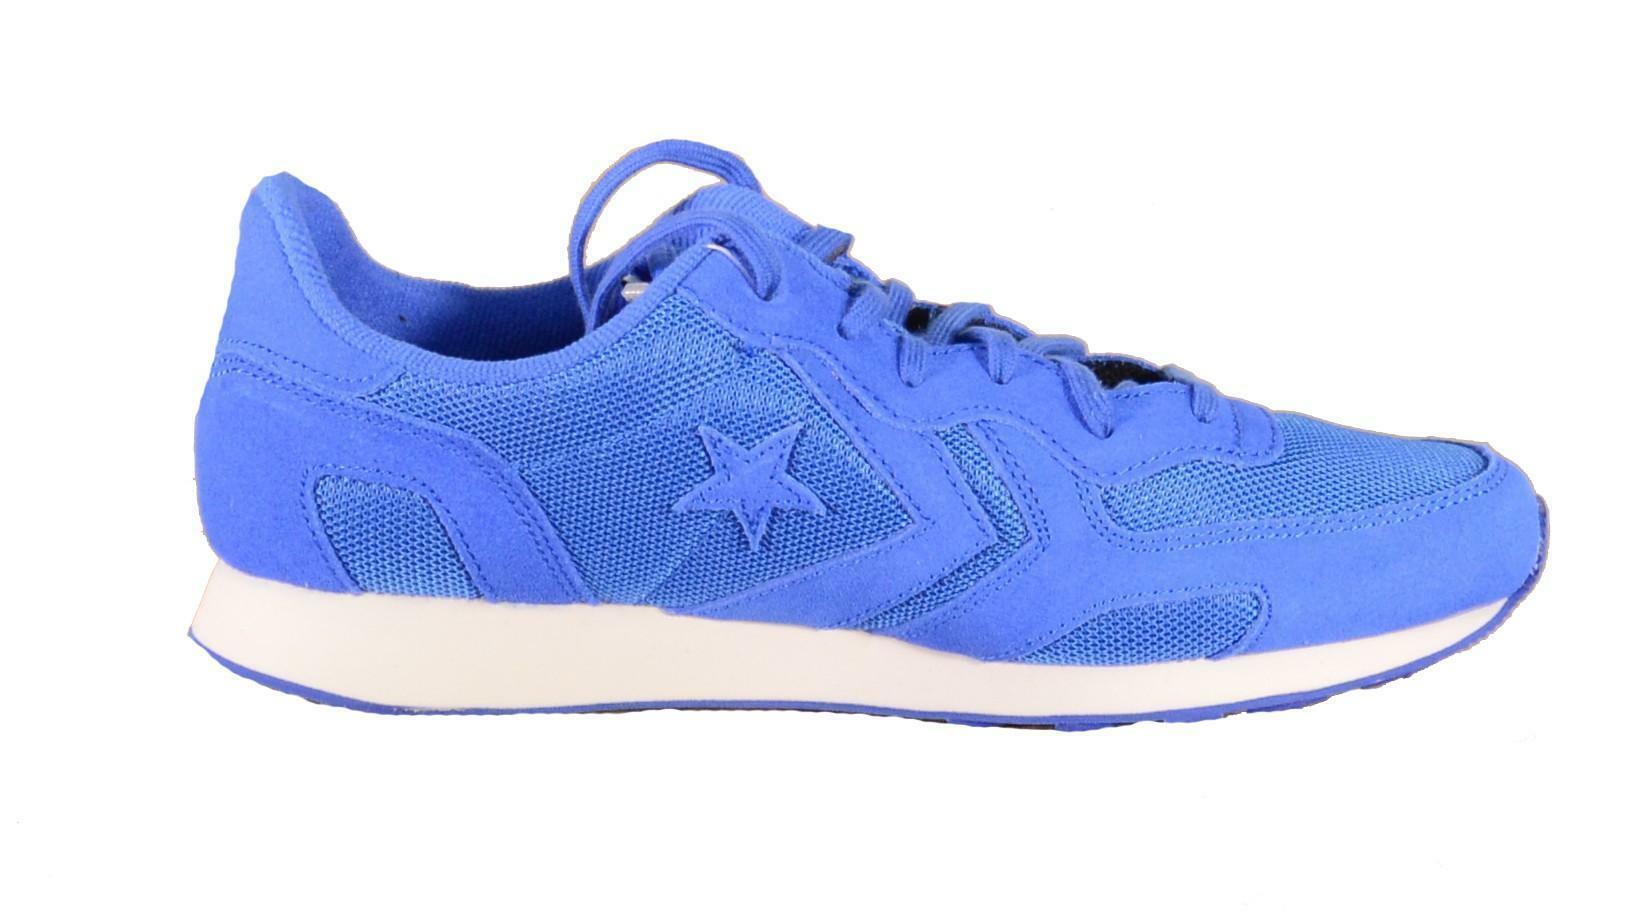 converse converse auckland racer ox scarpe sportive uomo blu tela 152678c